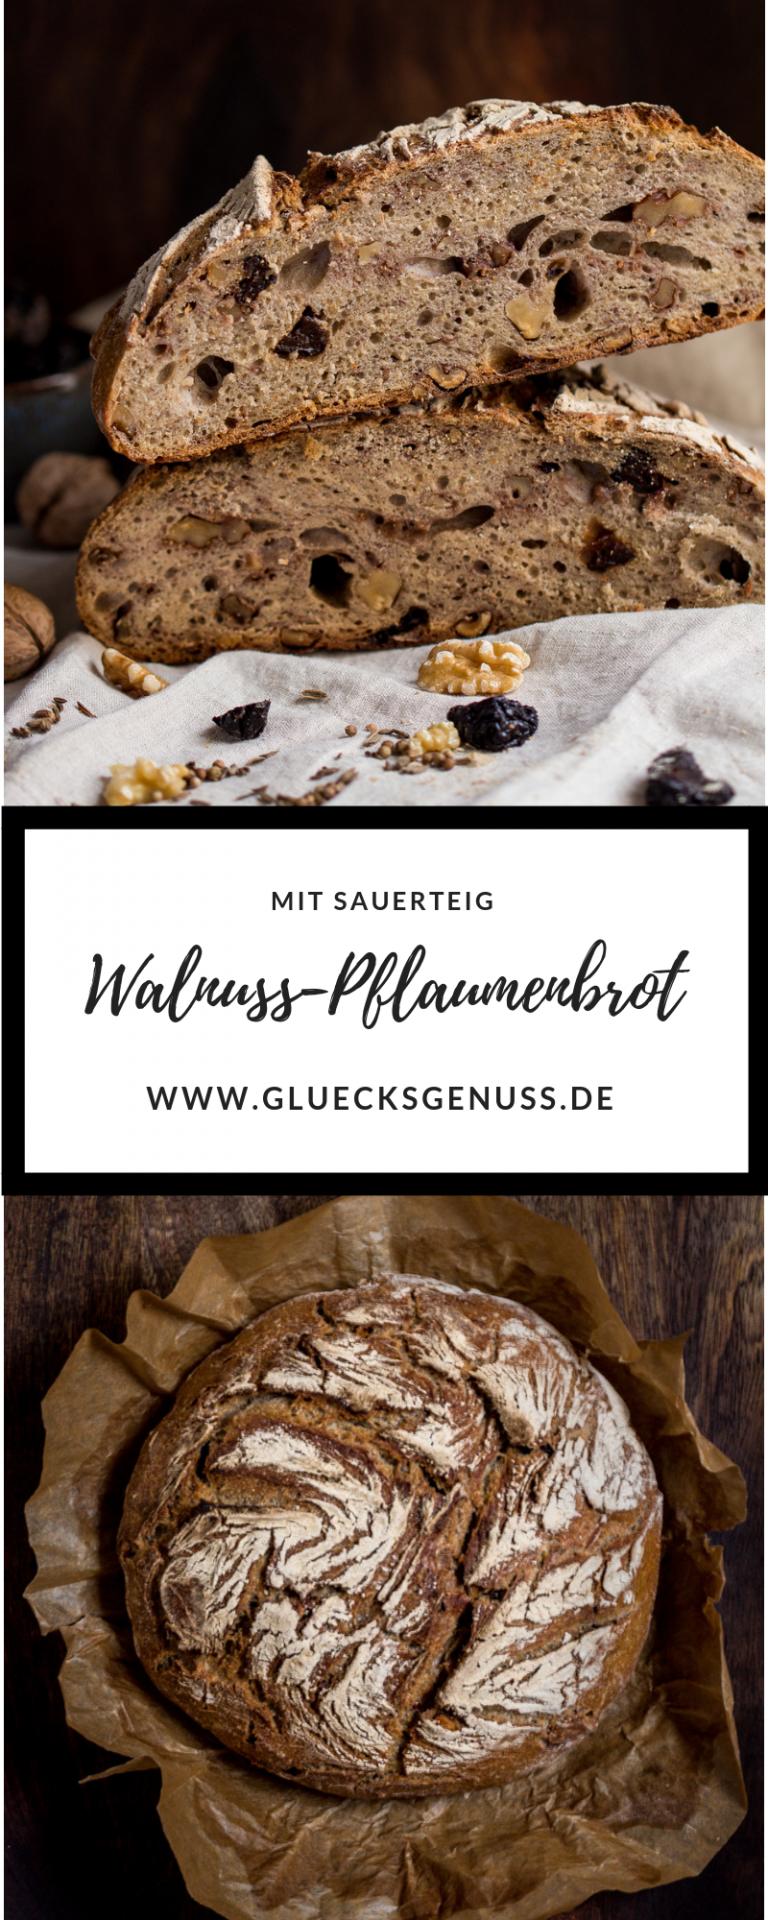 Walnuss-Pflaumenbrot